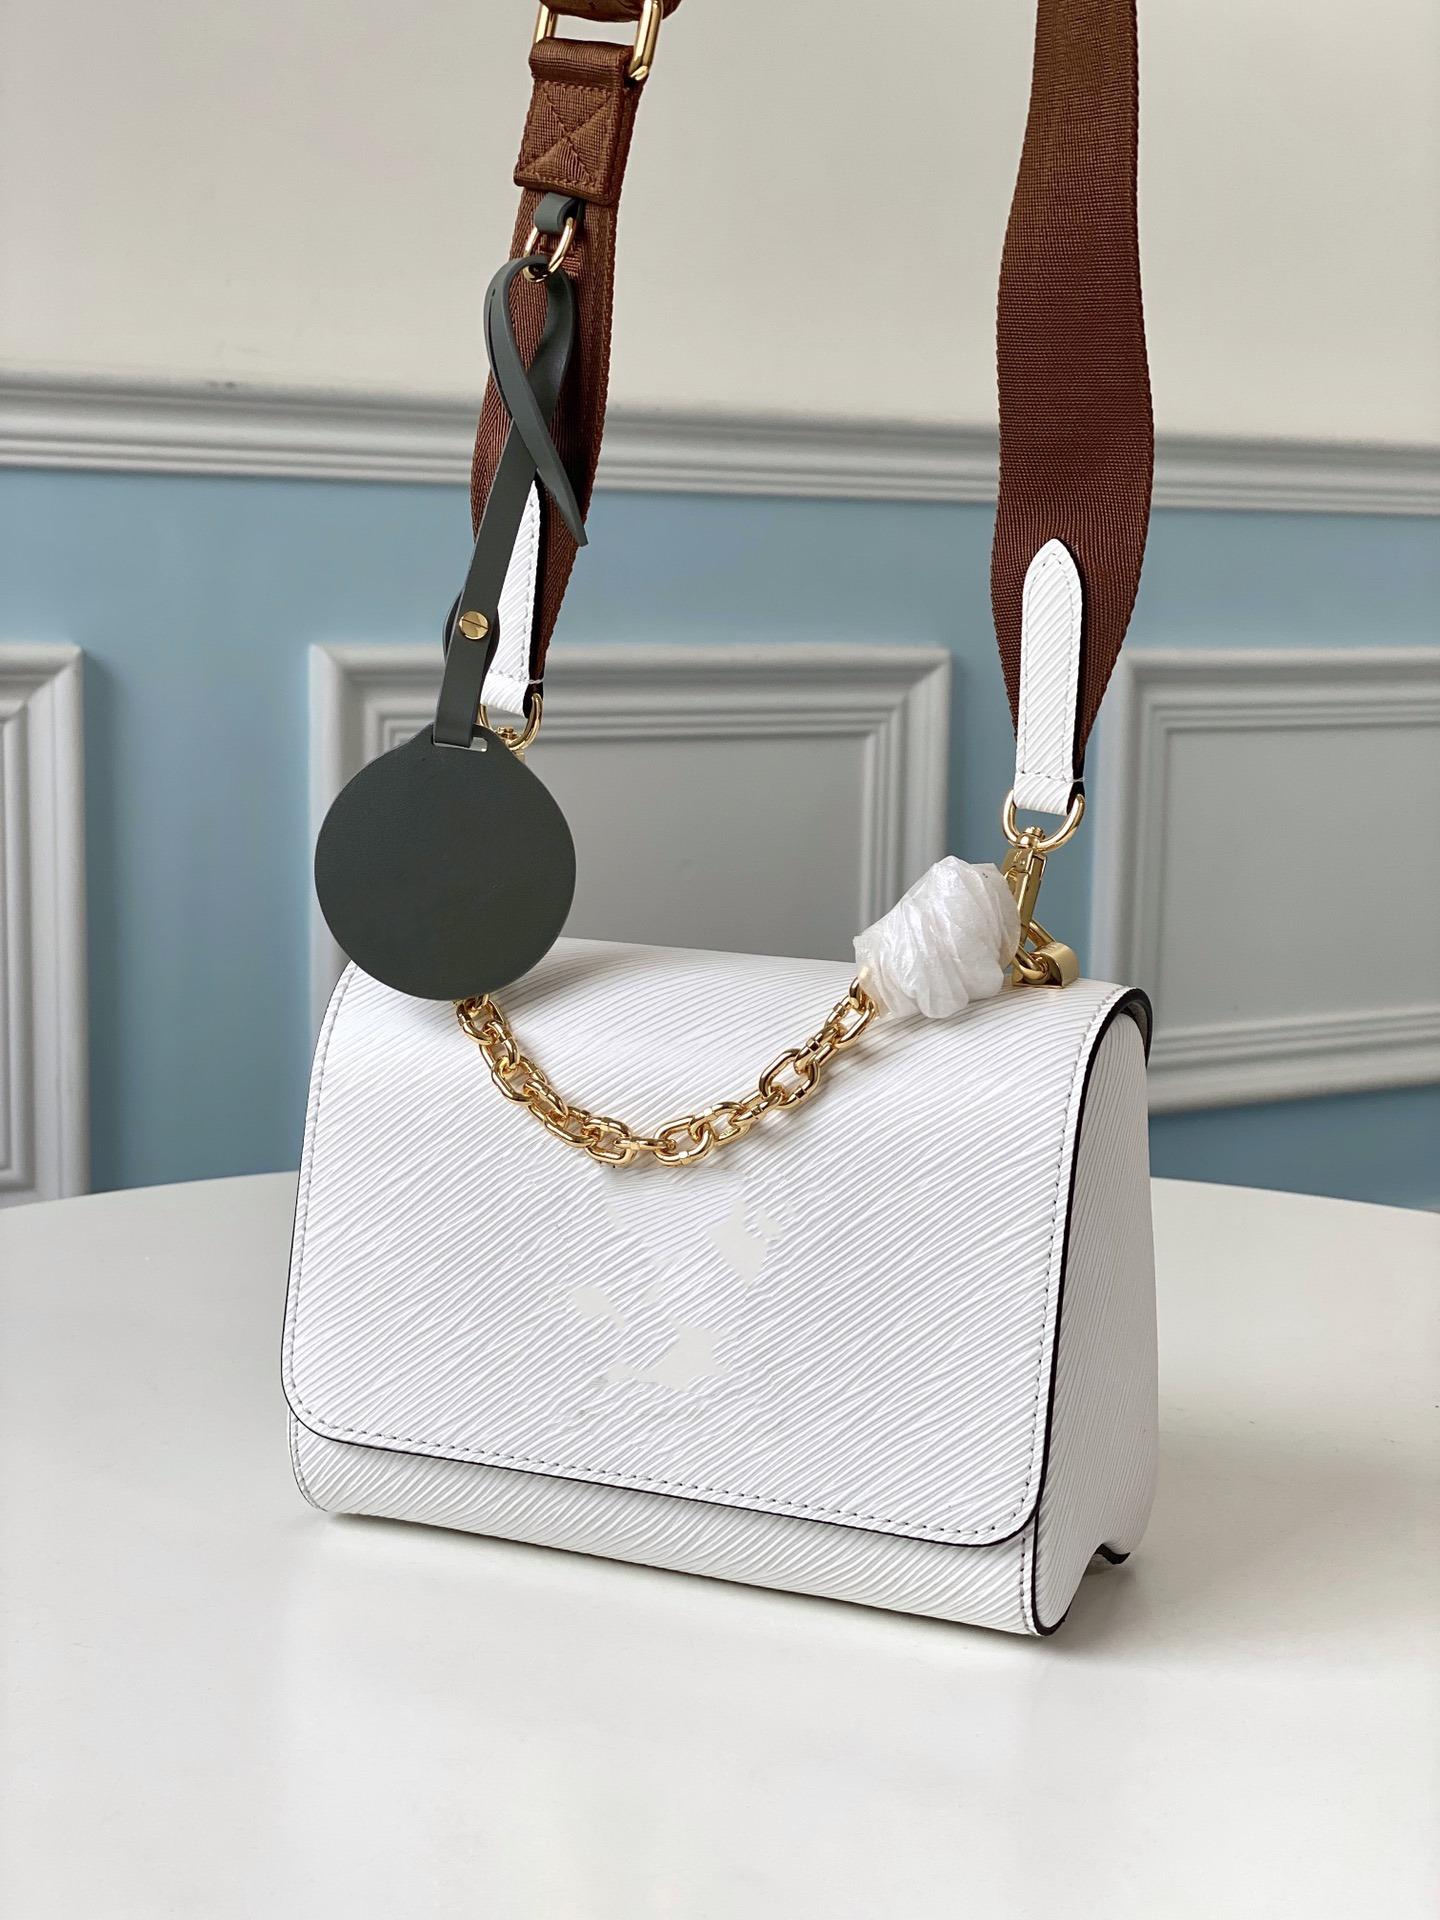 Designer shoulder bag ladies bag white classic style M56628 special users